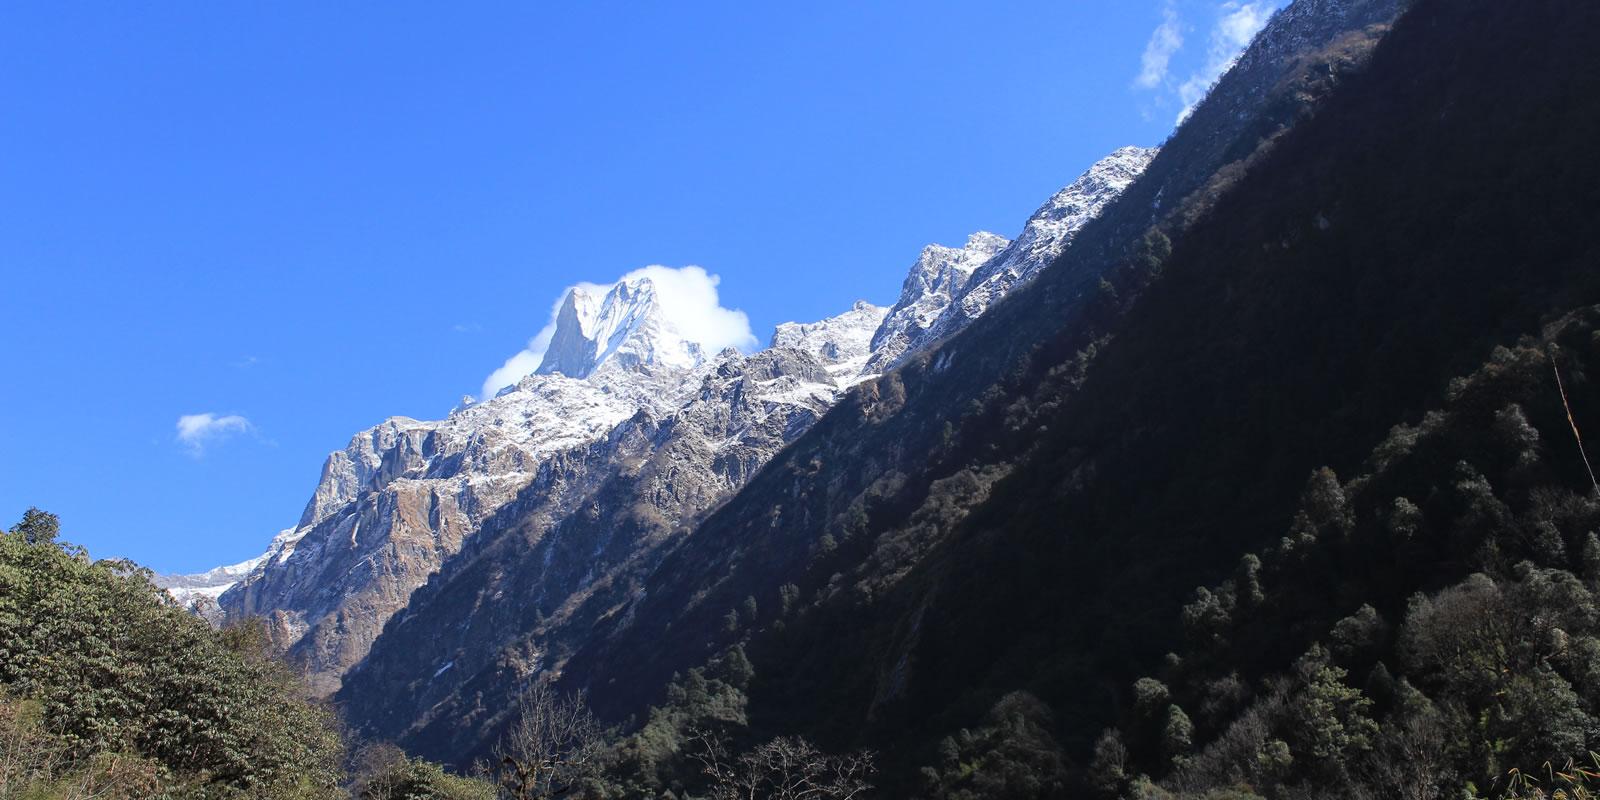 Annapurna Bc Ghorepani Trek discover himalayan trek